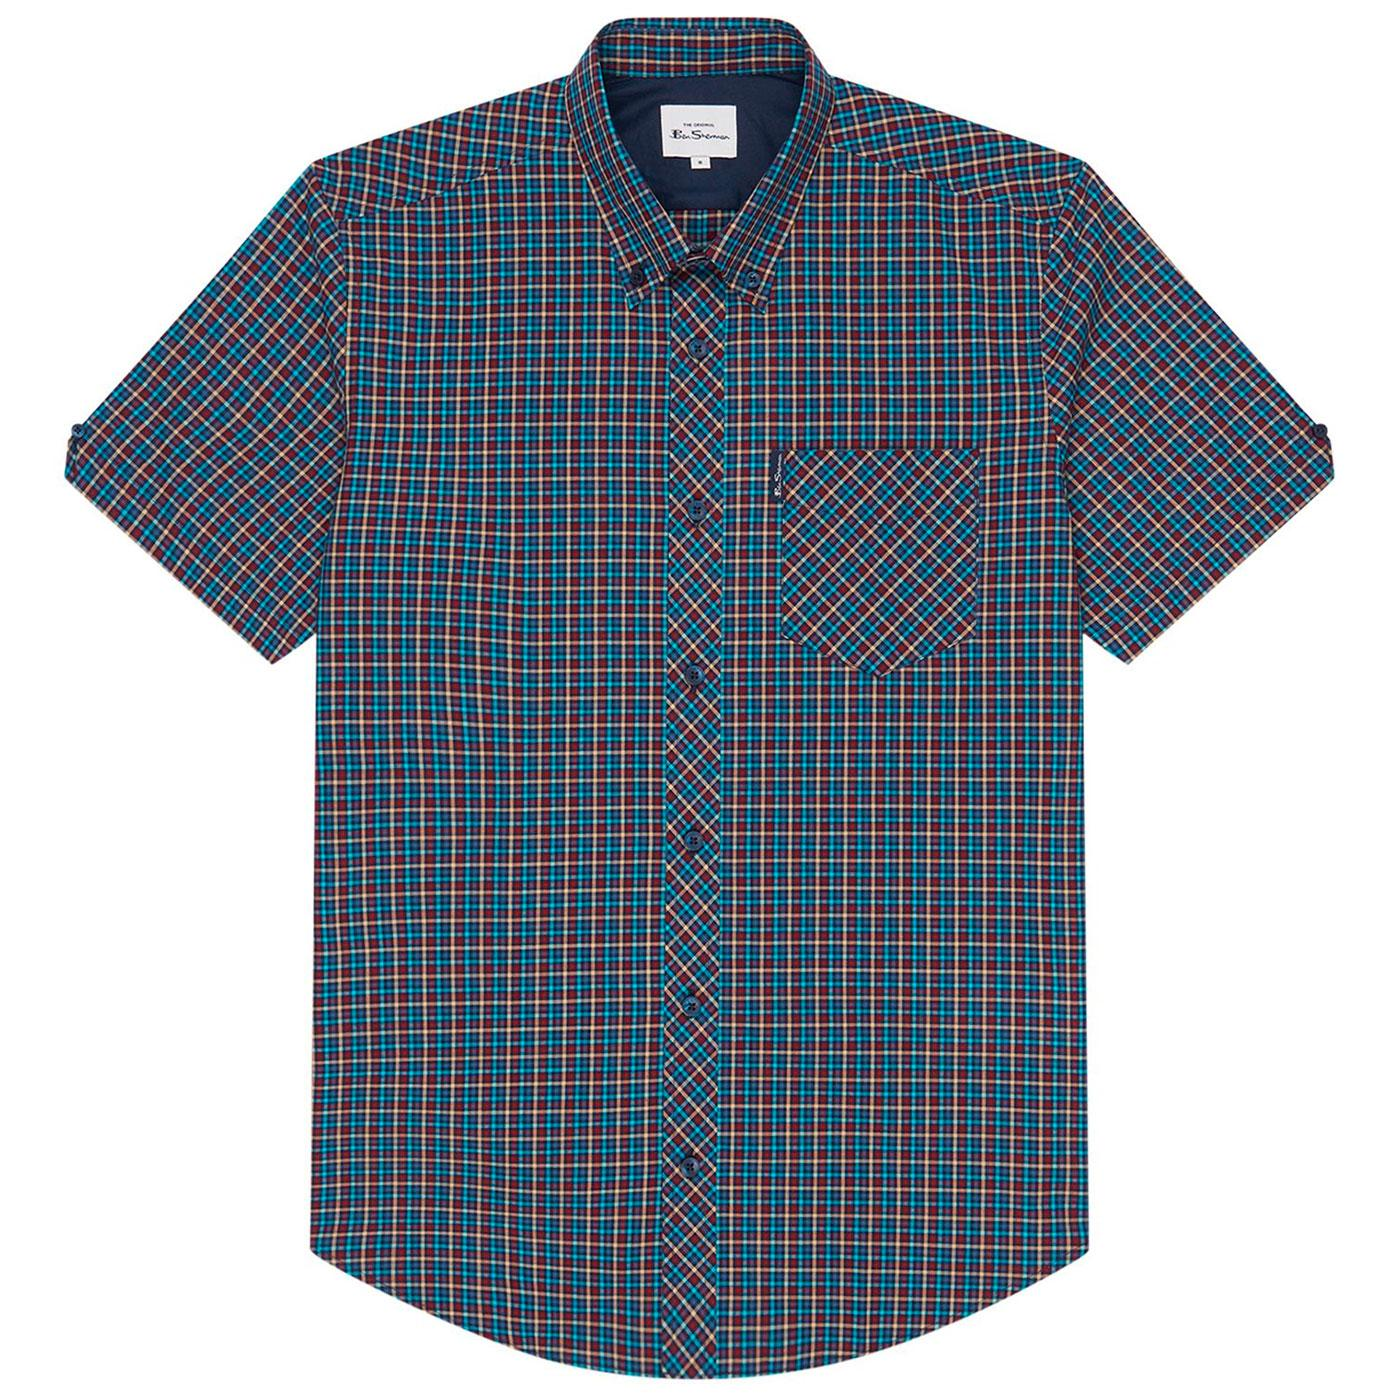 BEN SHERMAN Retro Mod Mini Gingham Check Shirt M